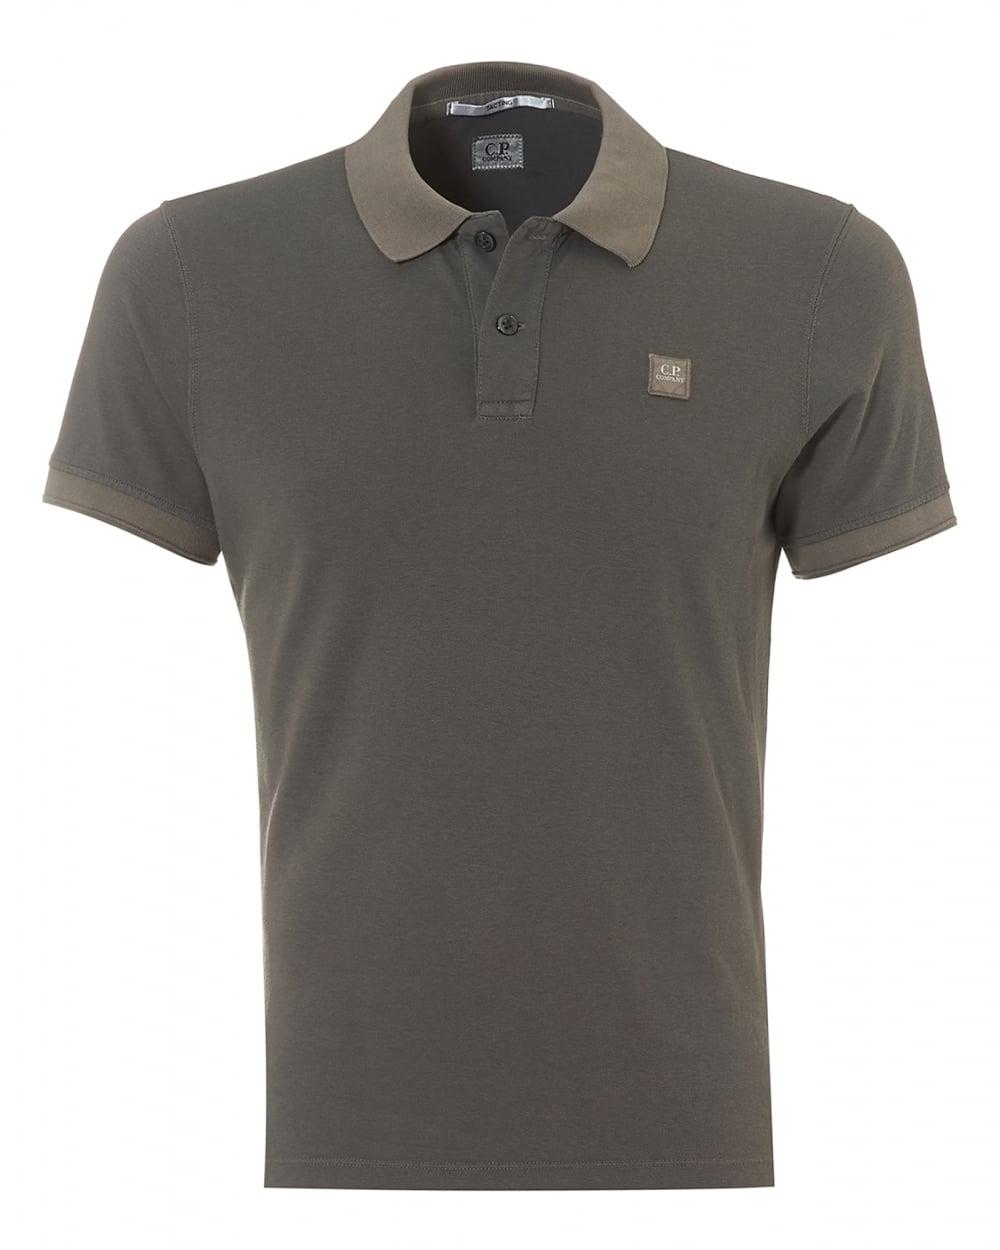 C p company mens plain grey regular fit logo polo shirt for Polo shirt with company logo